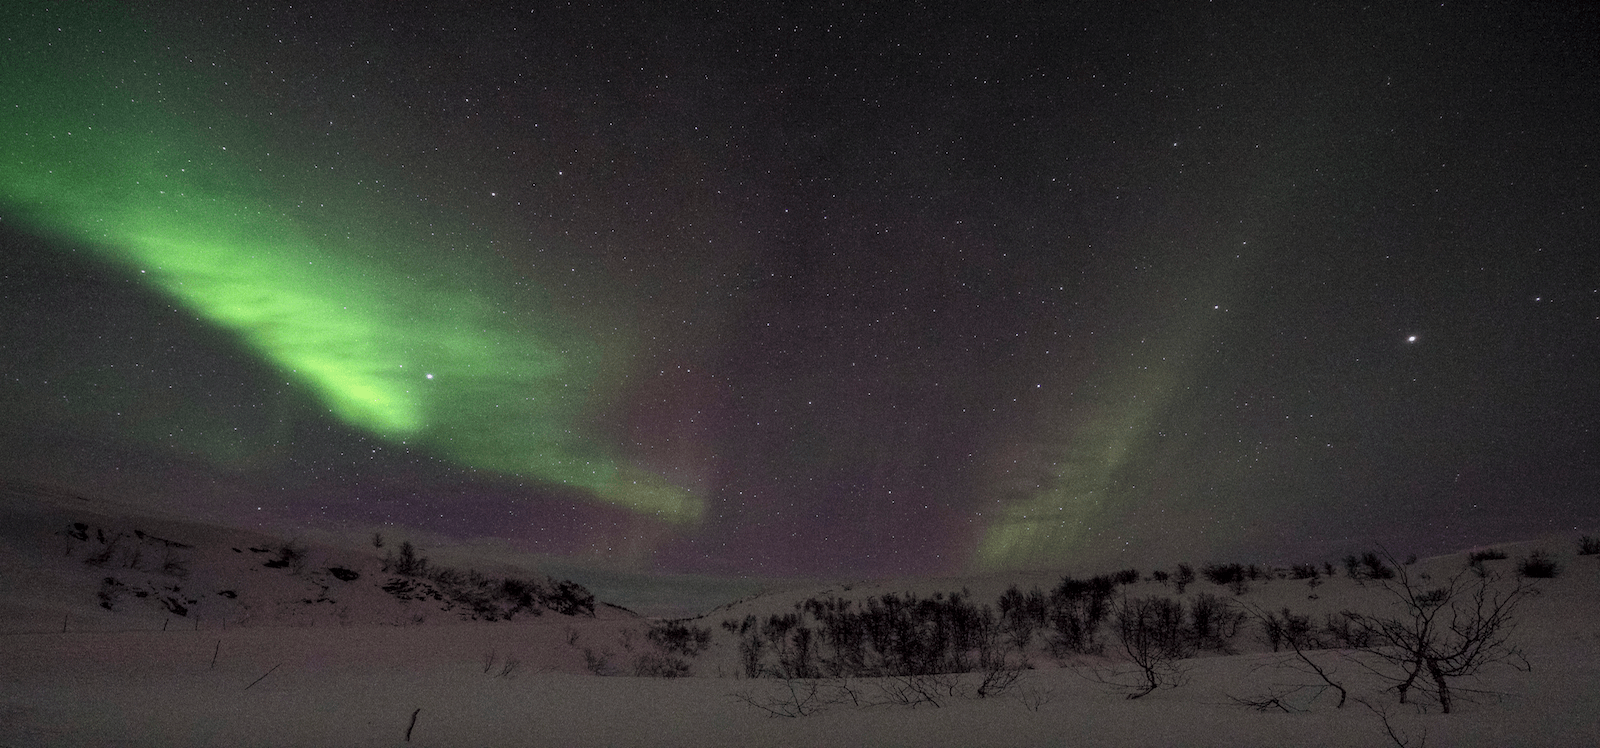 Green northern lights above snow landscape